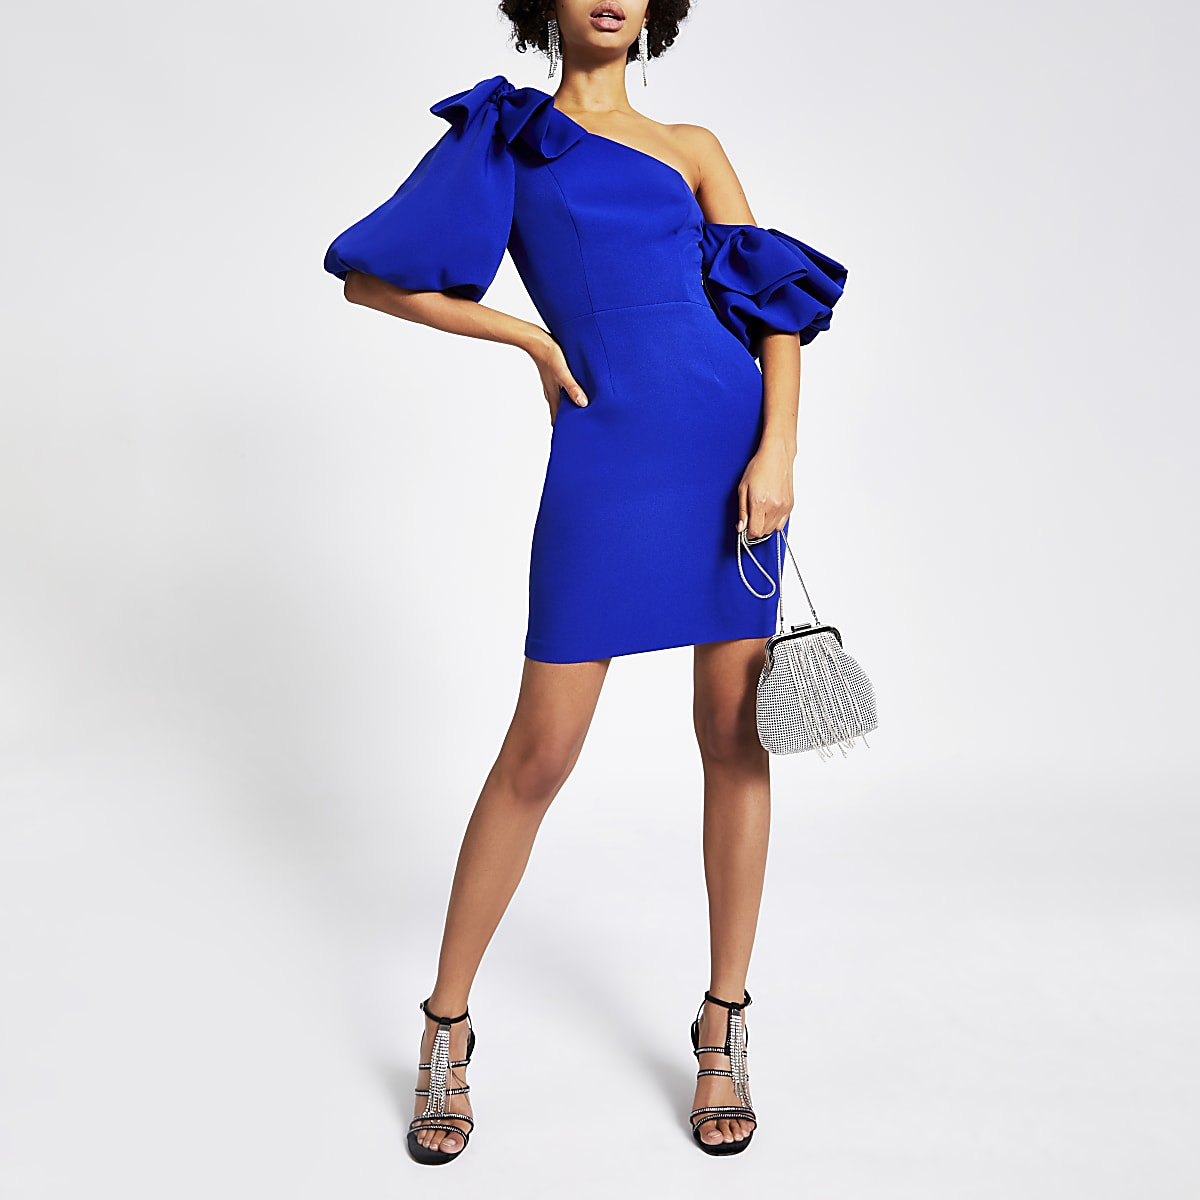 Mini-robe moulante bleue avec manches bouffantesànœud